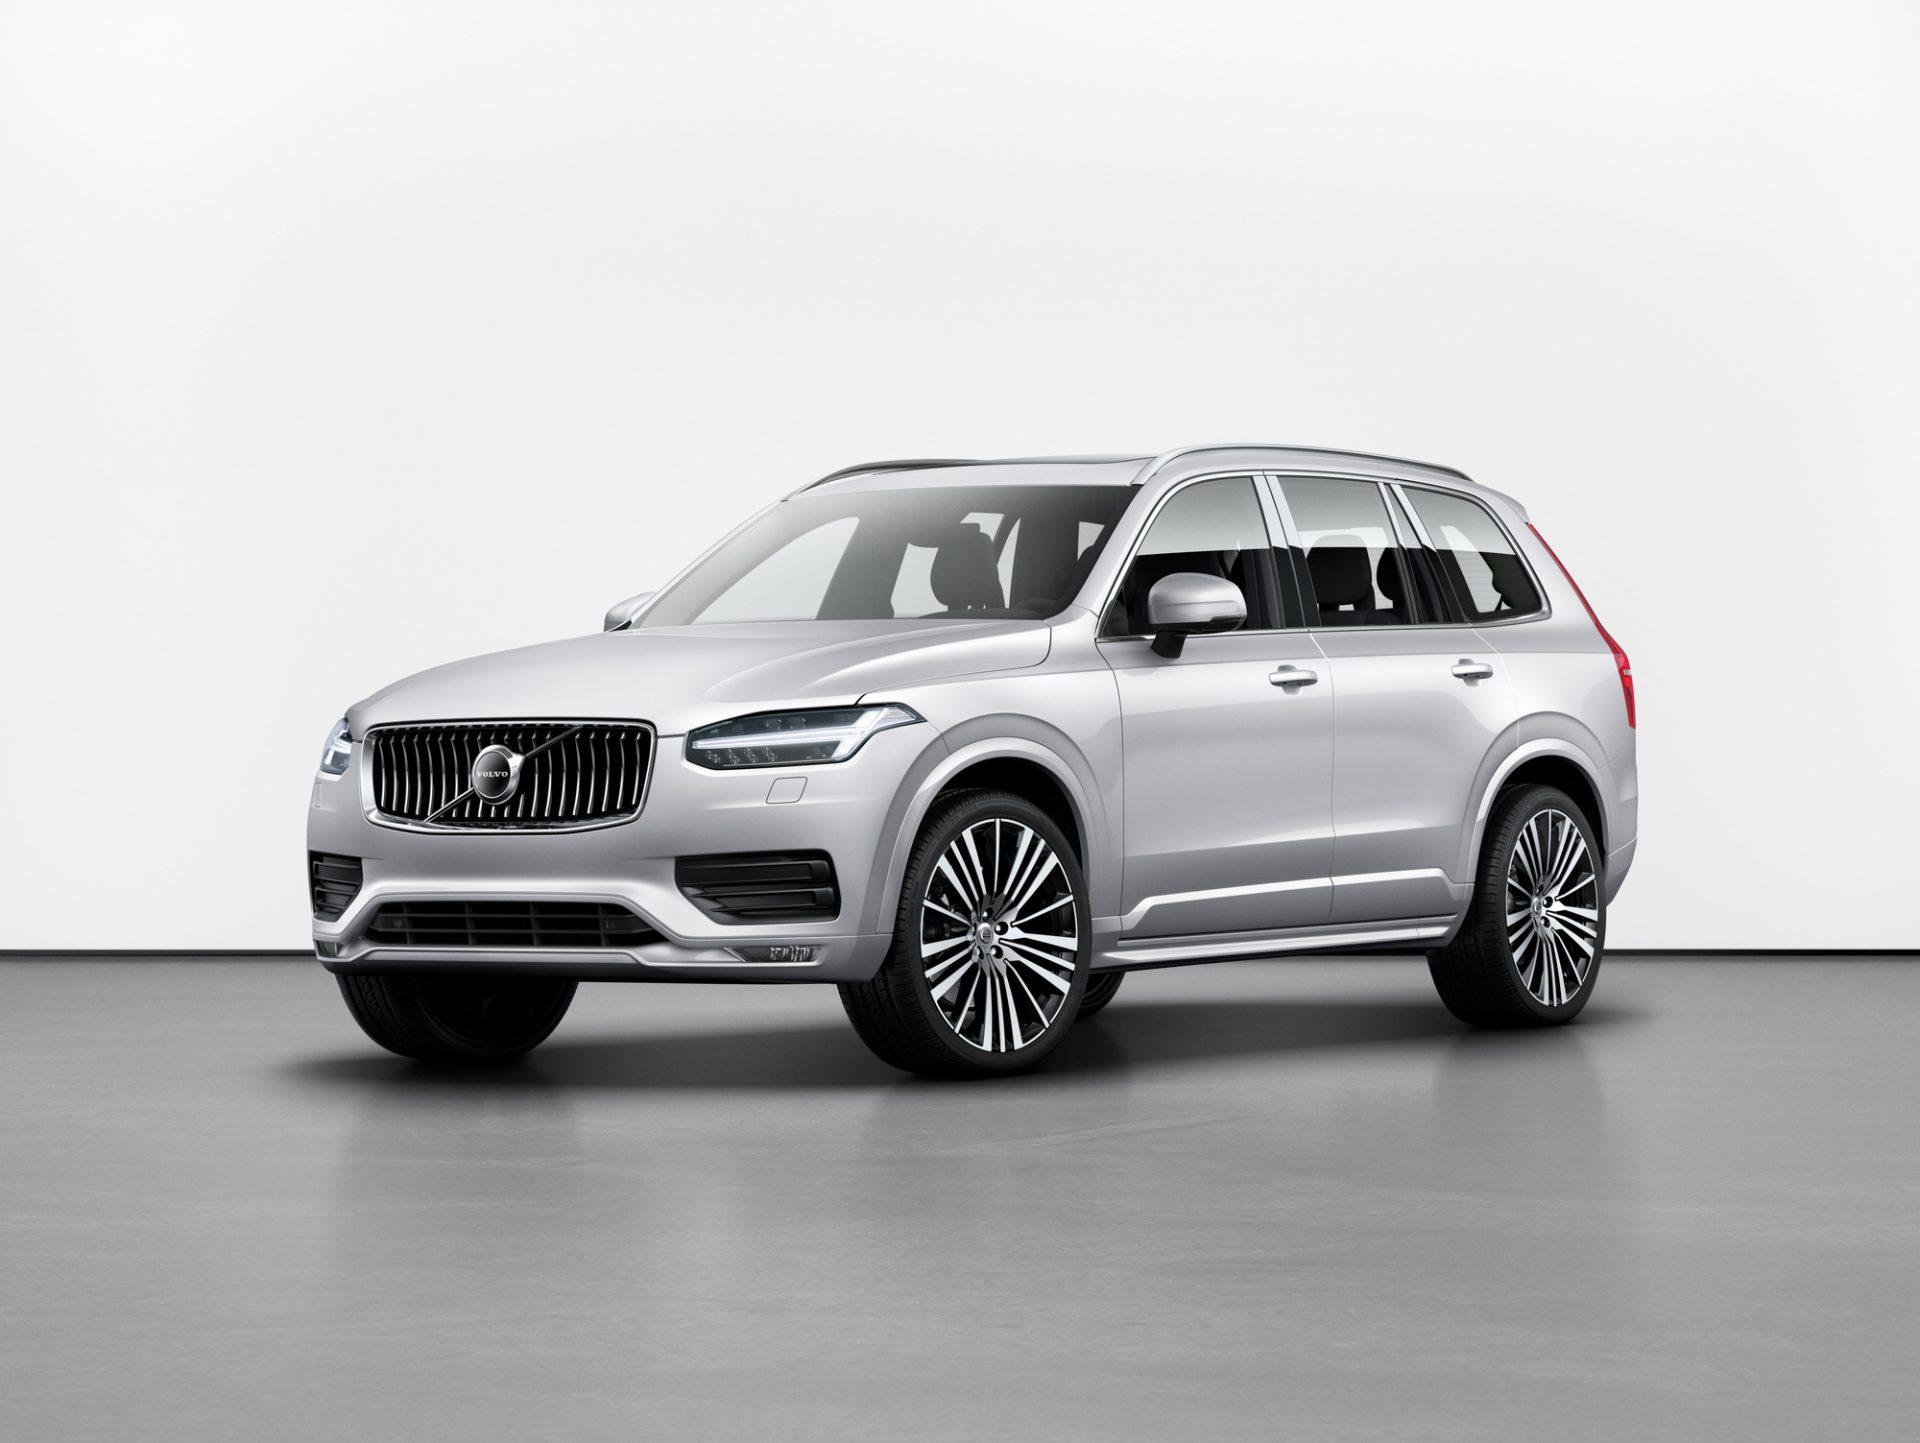 Volvo_XC90_Light version-VCC13112